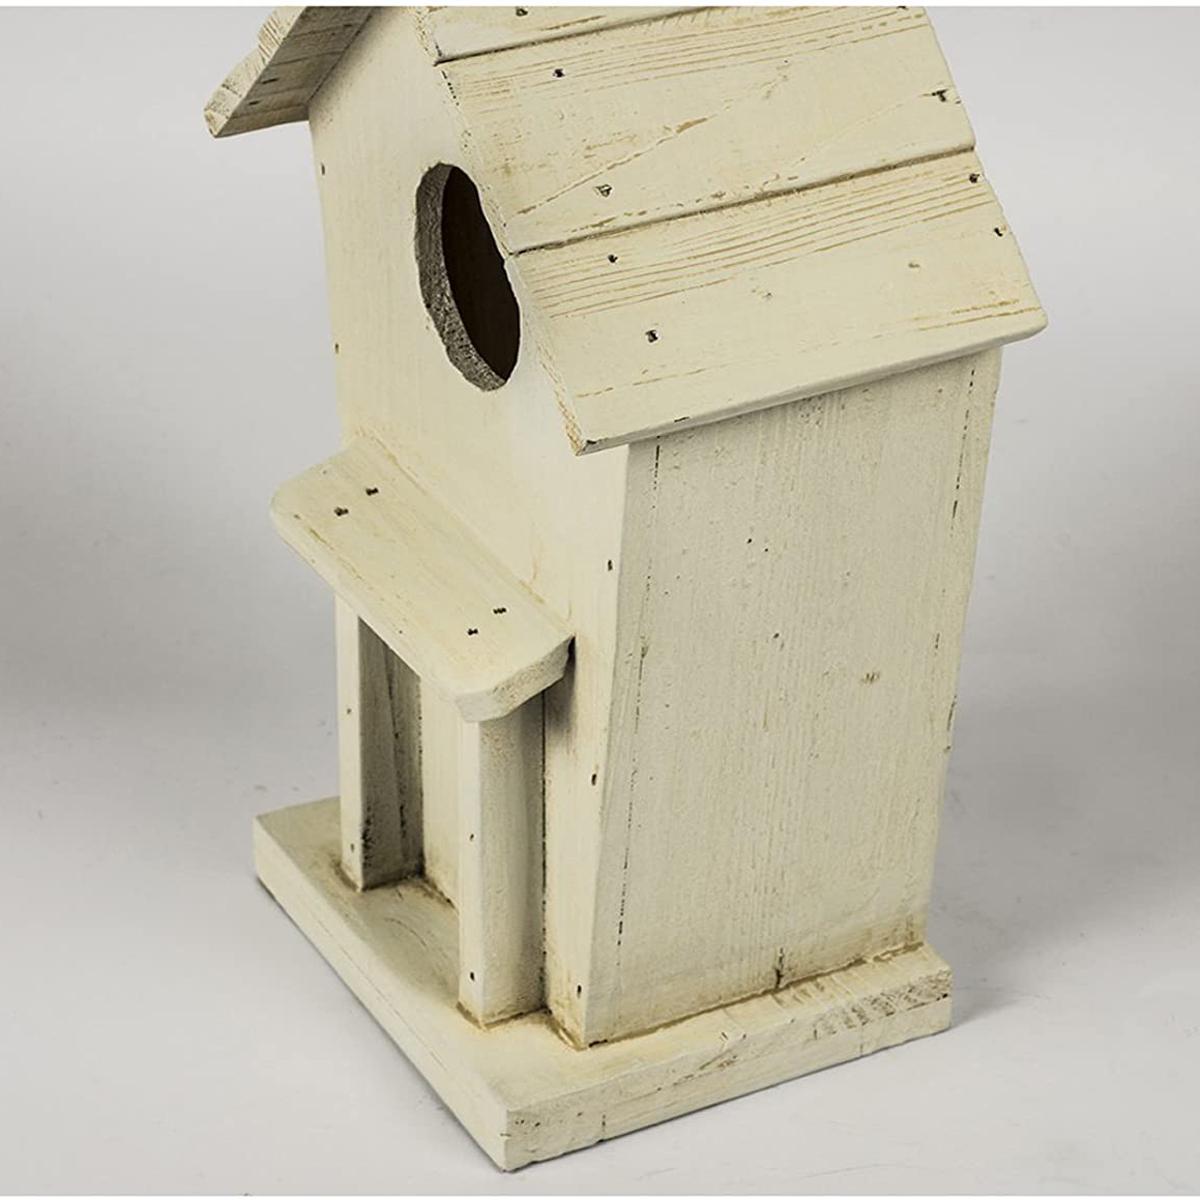 RAE007_5 hanging bird house